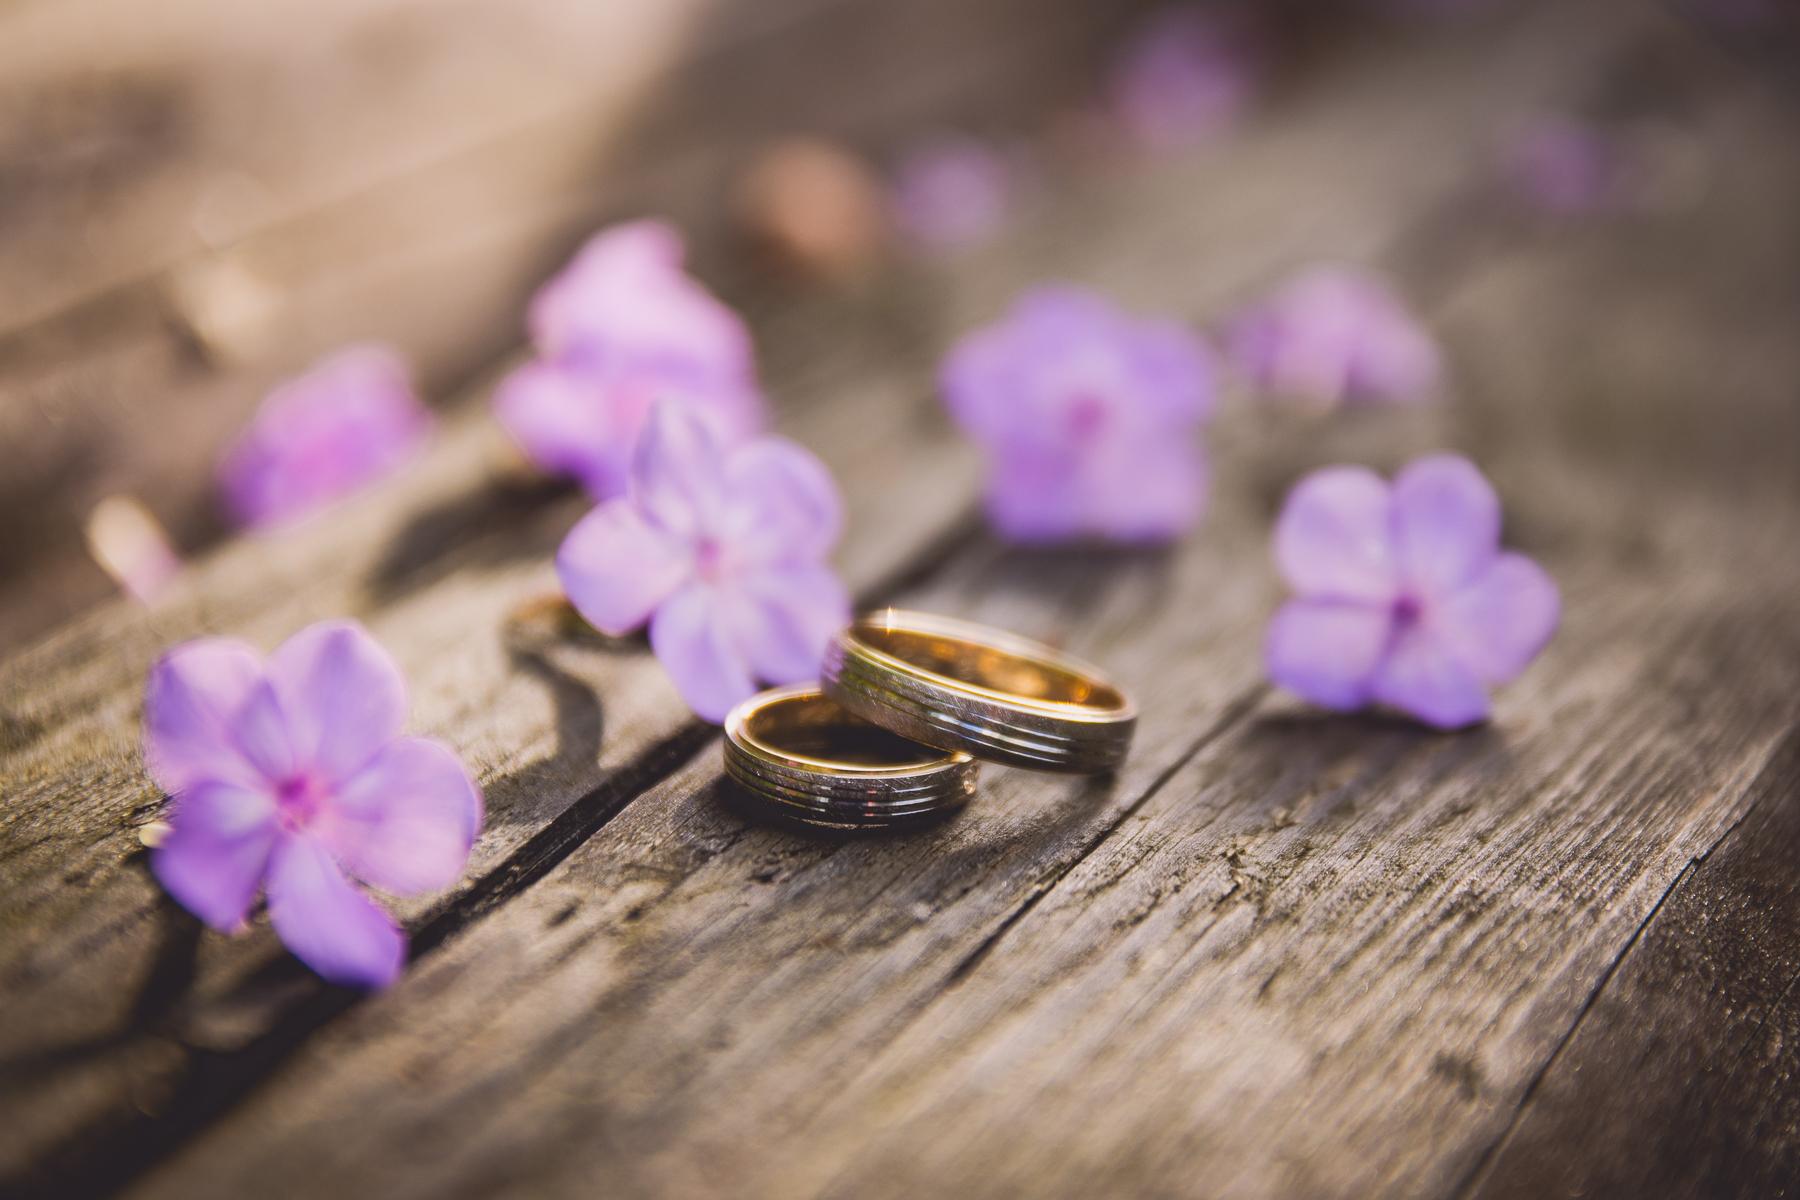 foceni-svatby-jihlava-a-okoli.jpg